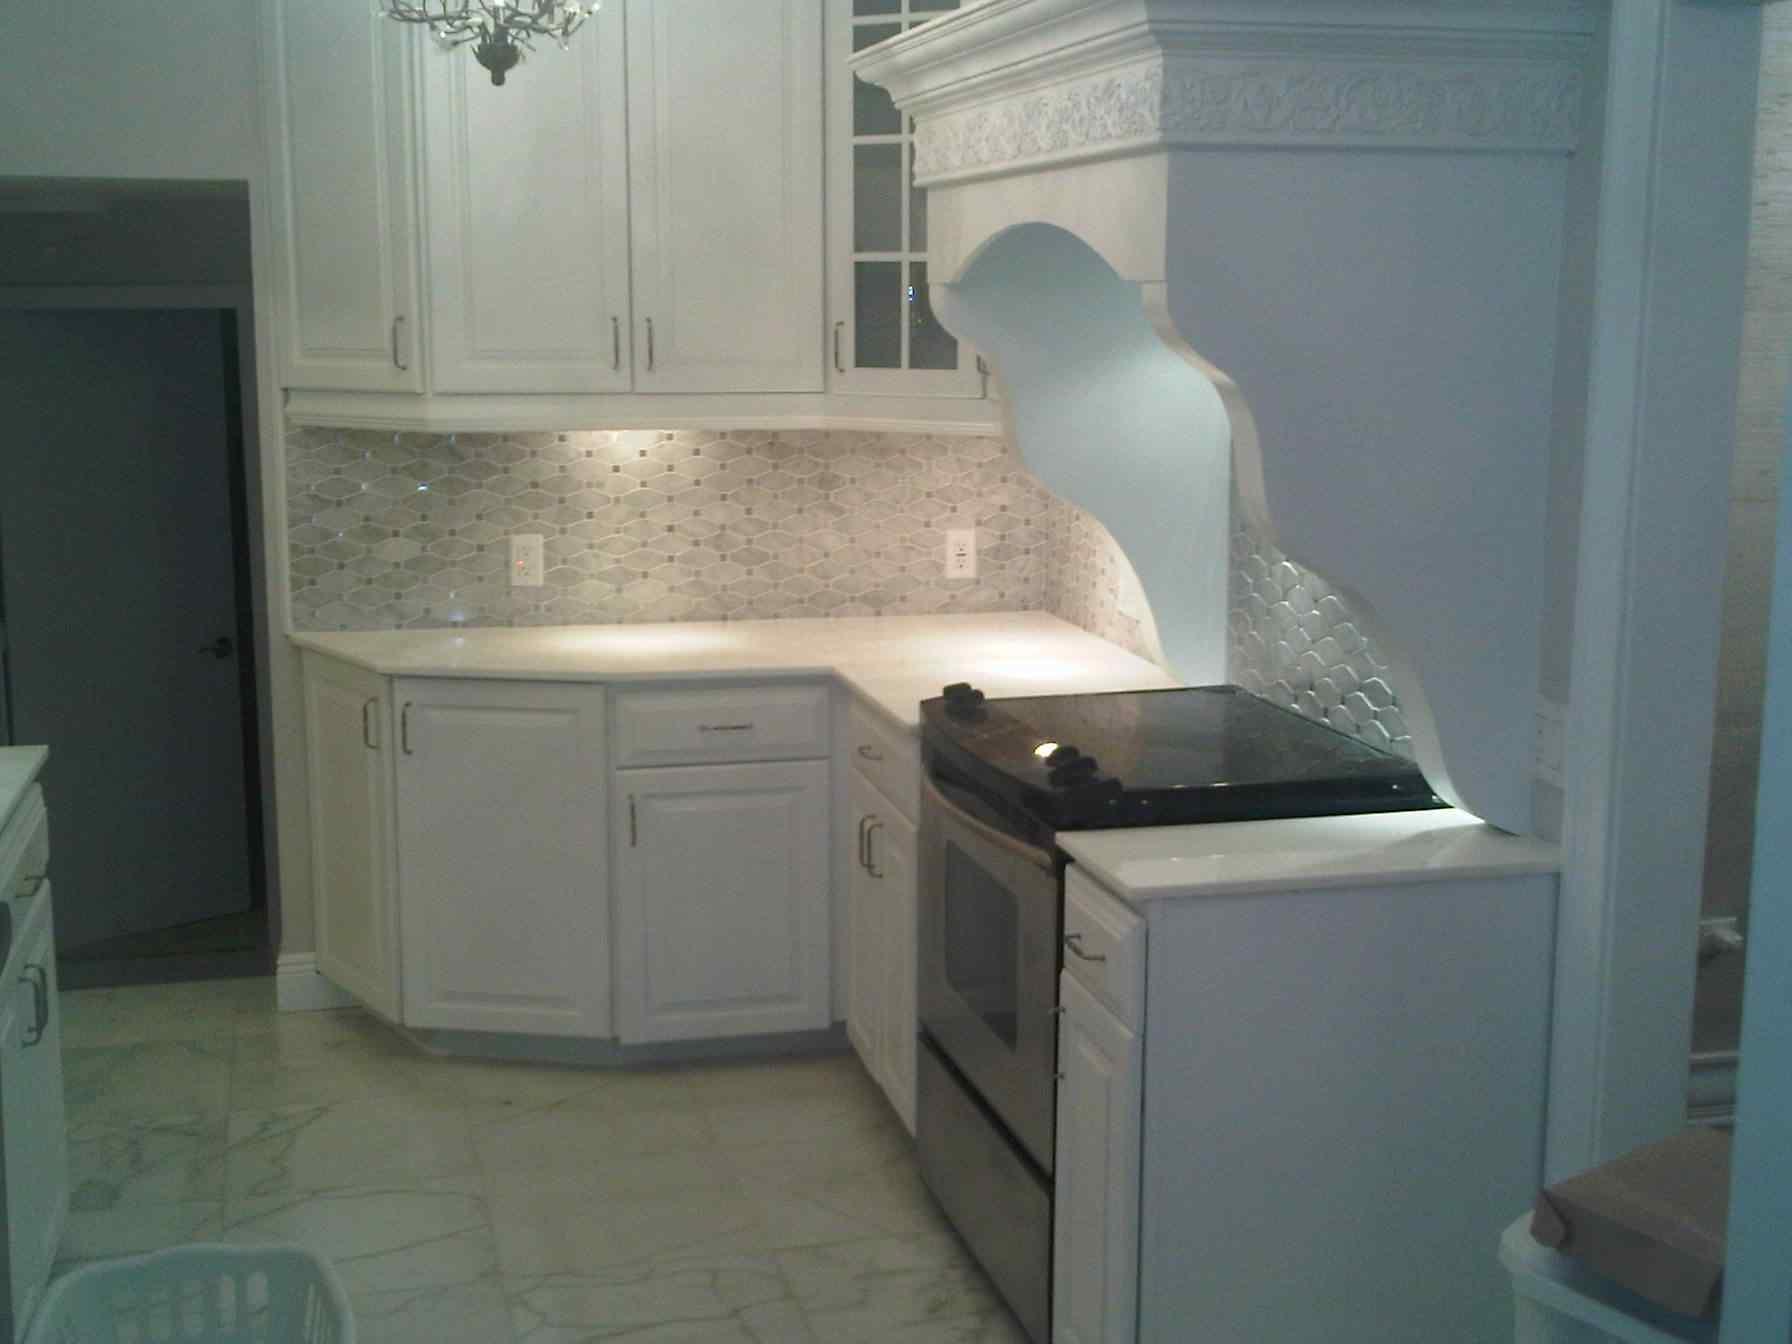 toni kitchen 2_1446035305_49497485 (1)